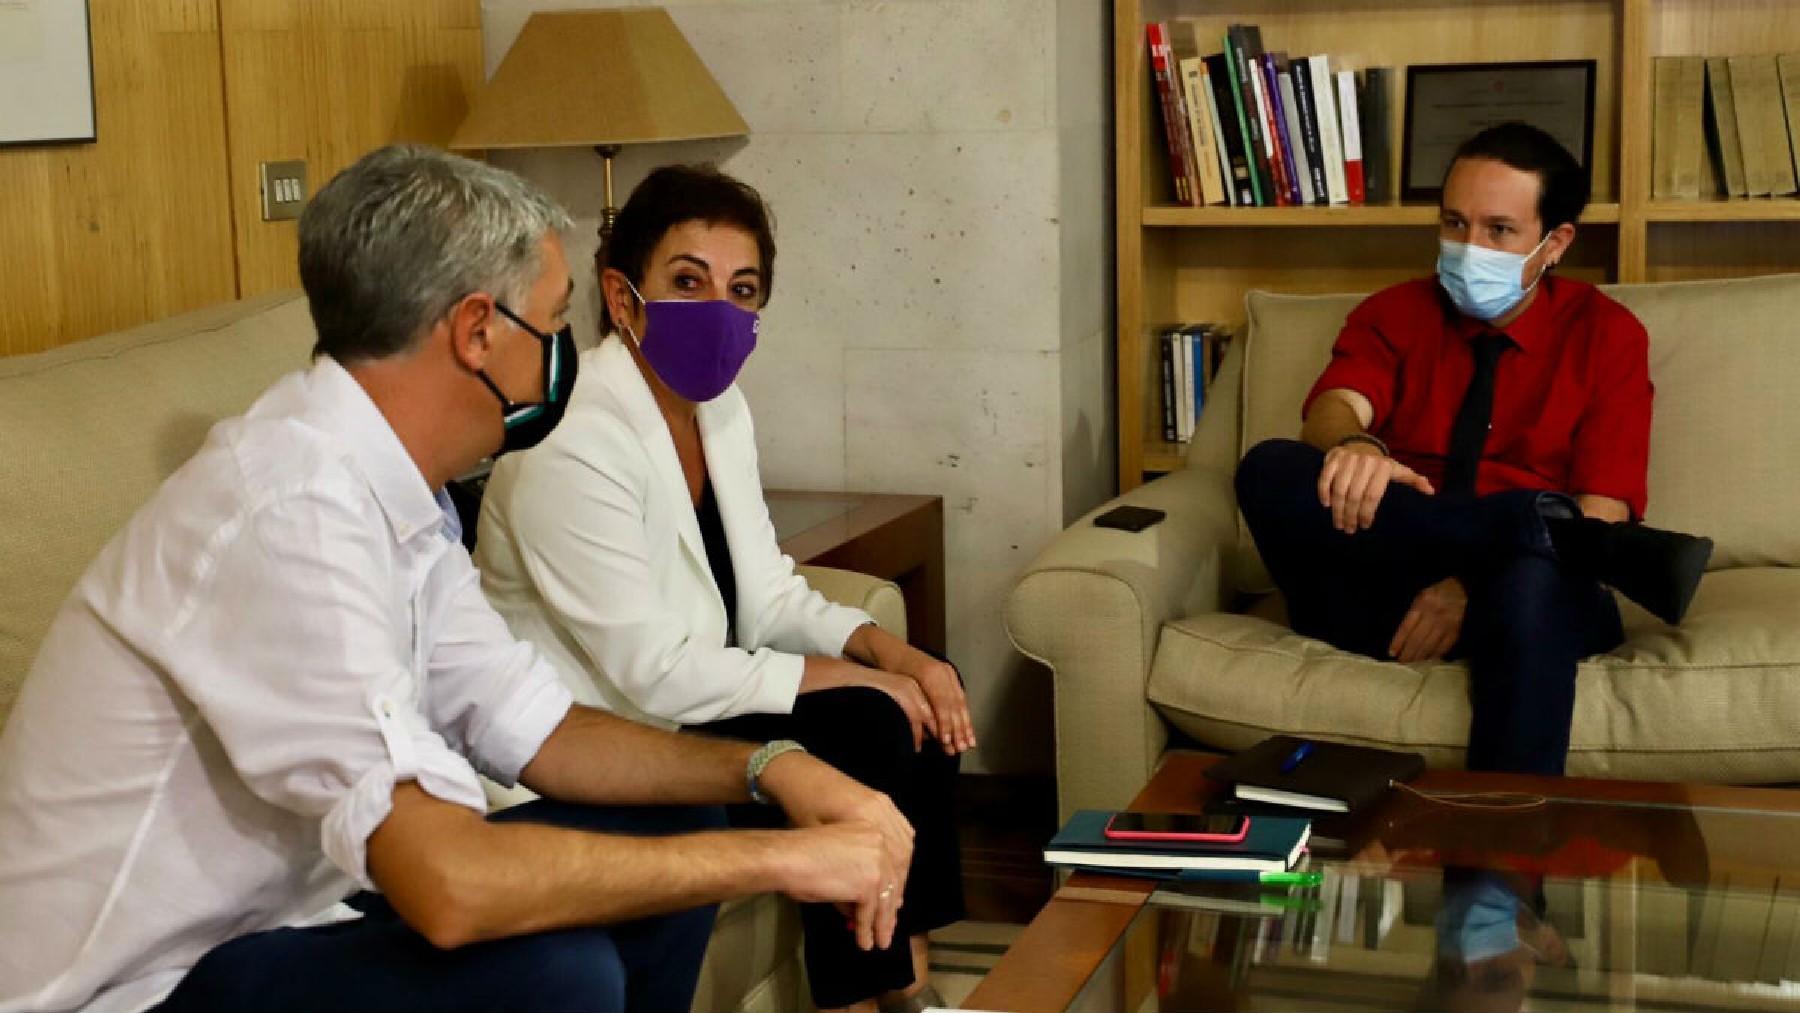 Pablo Iglesias reunido con Bildu cuando era vicepresidente del Gobierno. (su despacho con Mertxe Aizpuruay Oskar Matute. (Foto: Dani Gago / Gobierno)